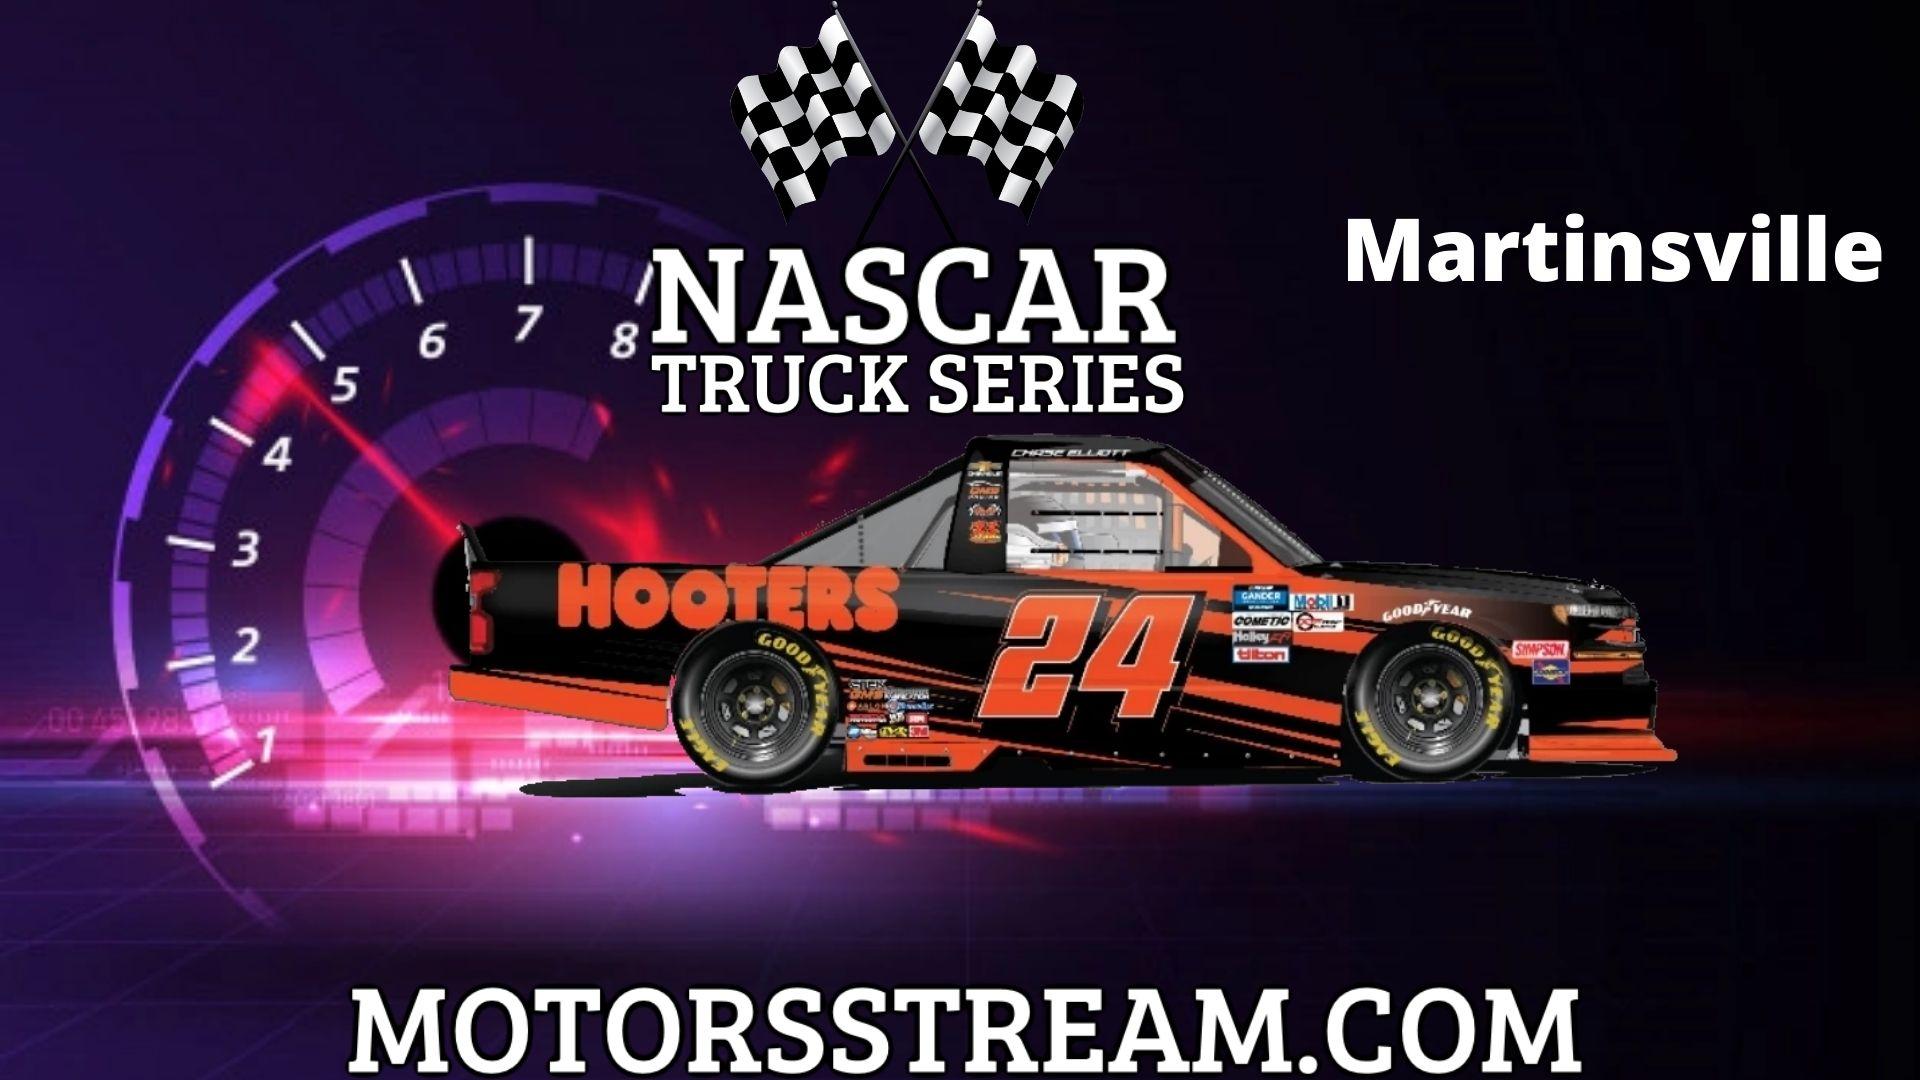 NASCAR Truck Series Race At Martinsville Live Stream | Martinsville 2021